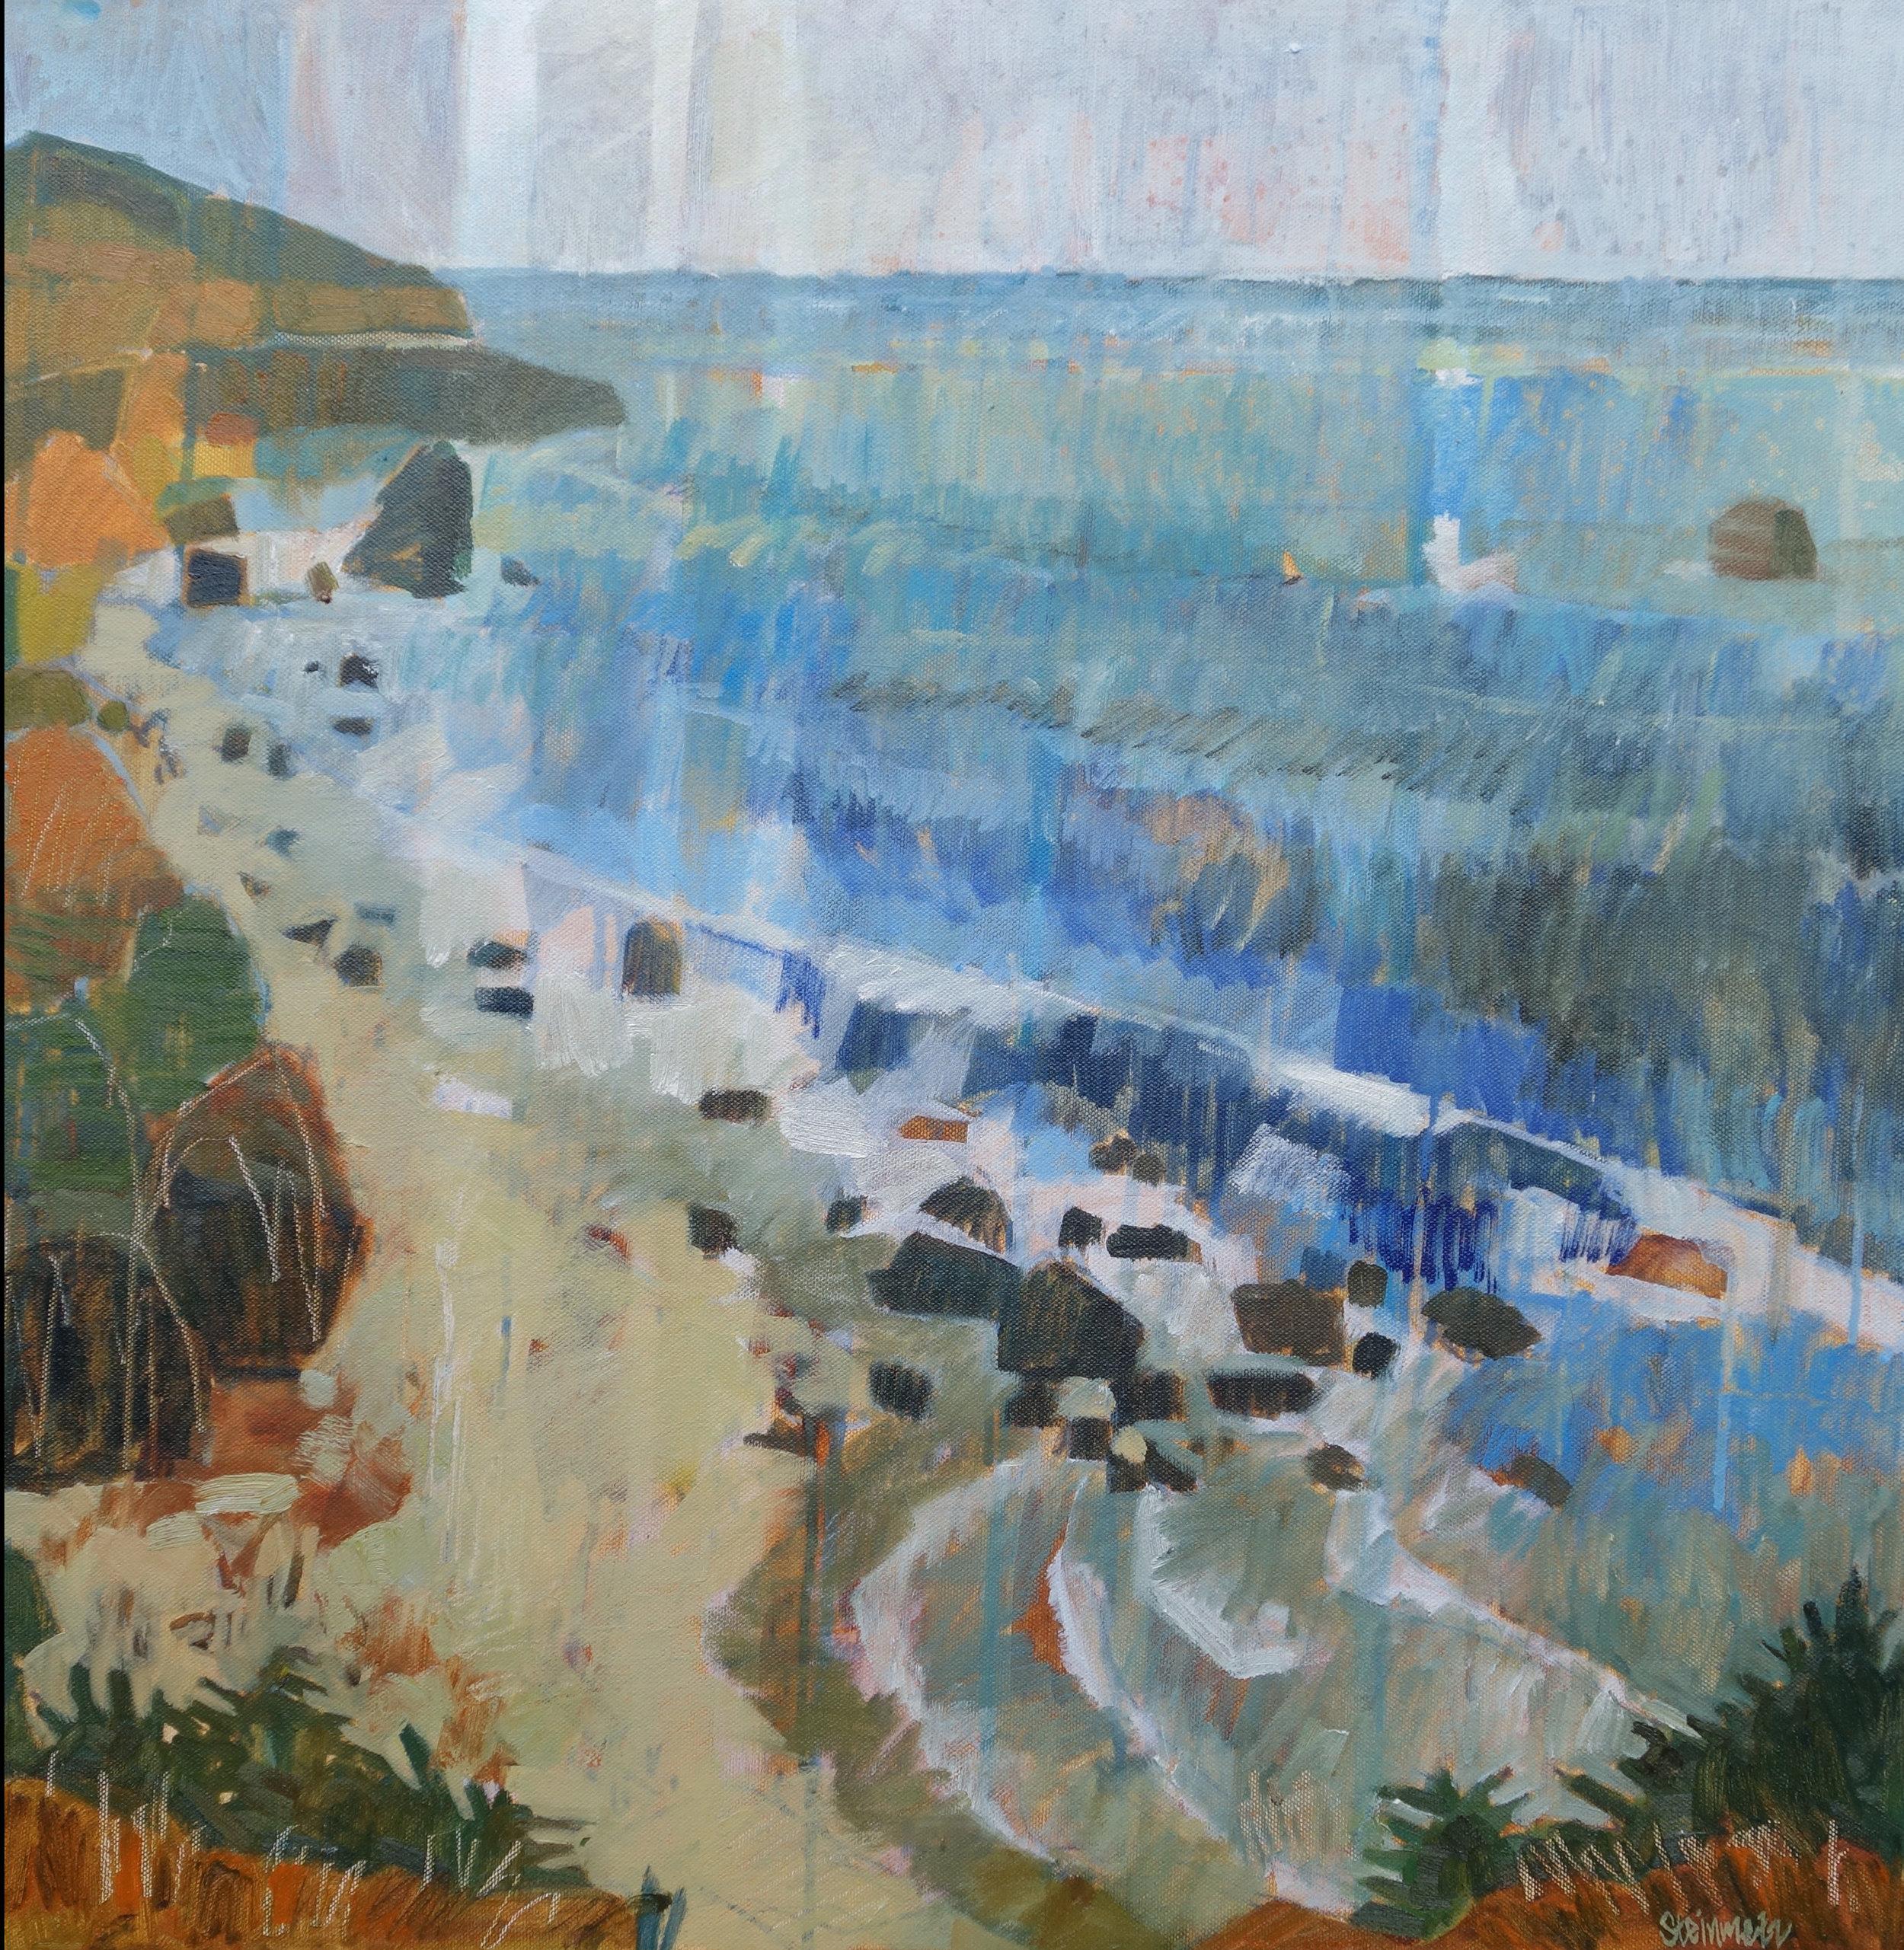 lands_end_beach_san_francisco_oil_landscape_painting-1.jpg